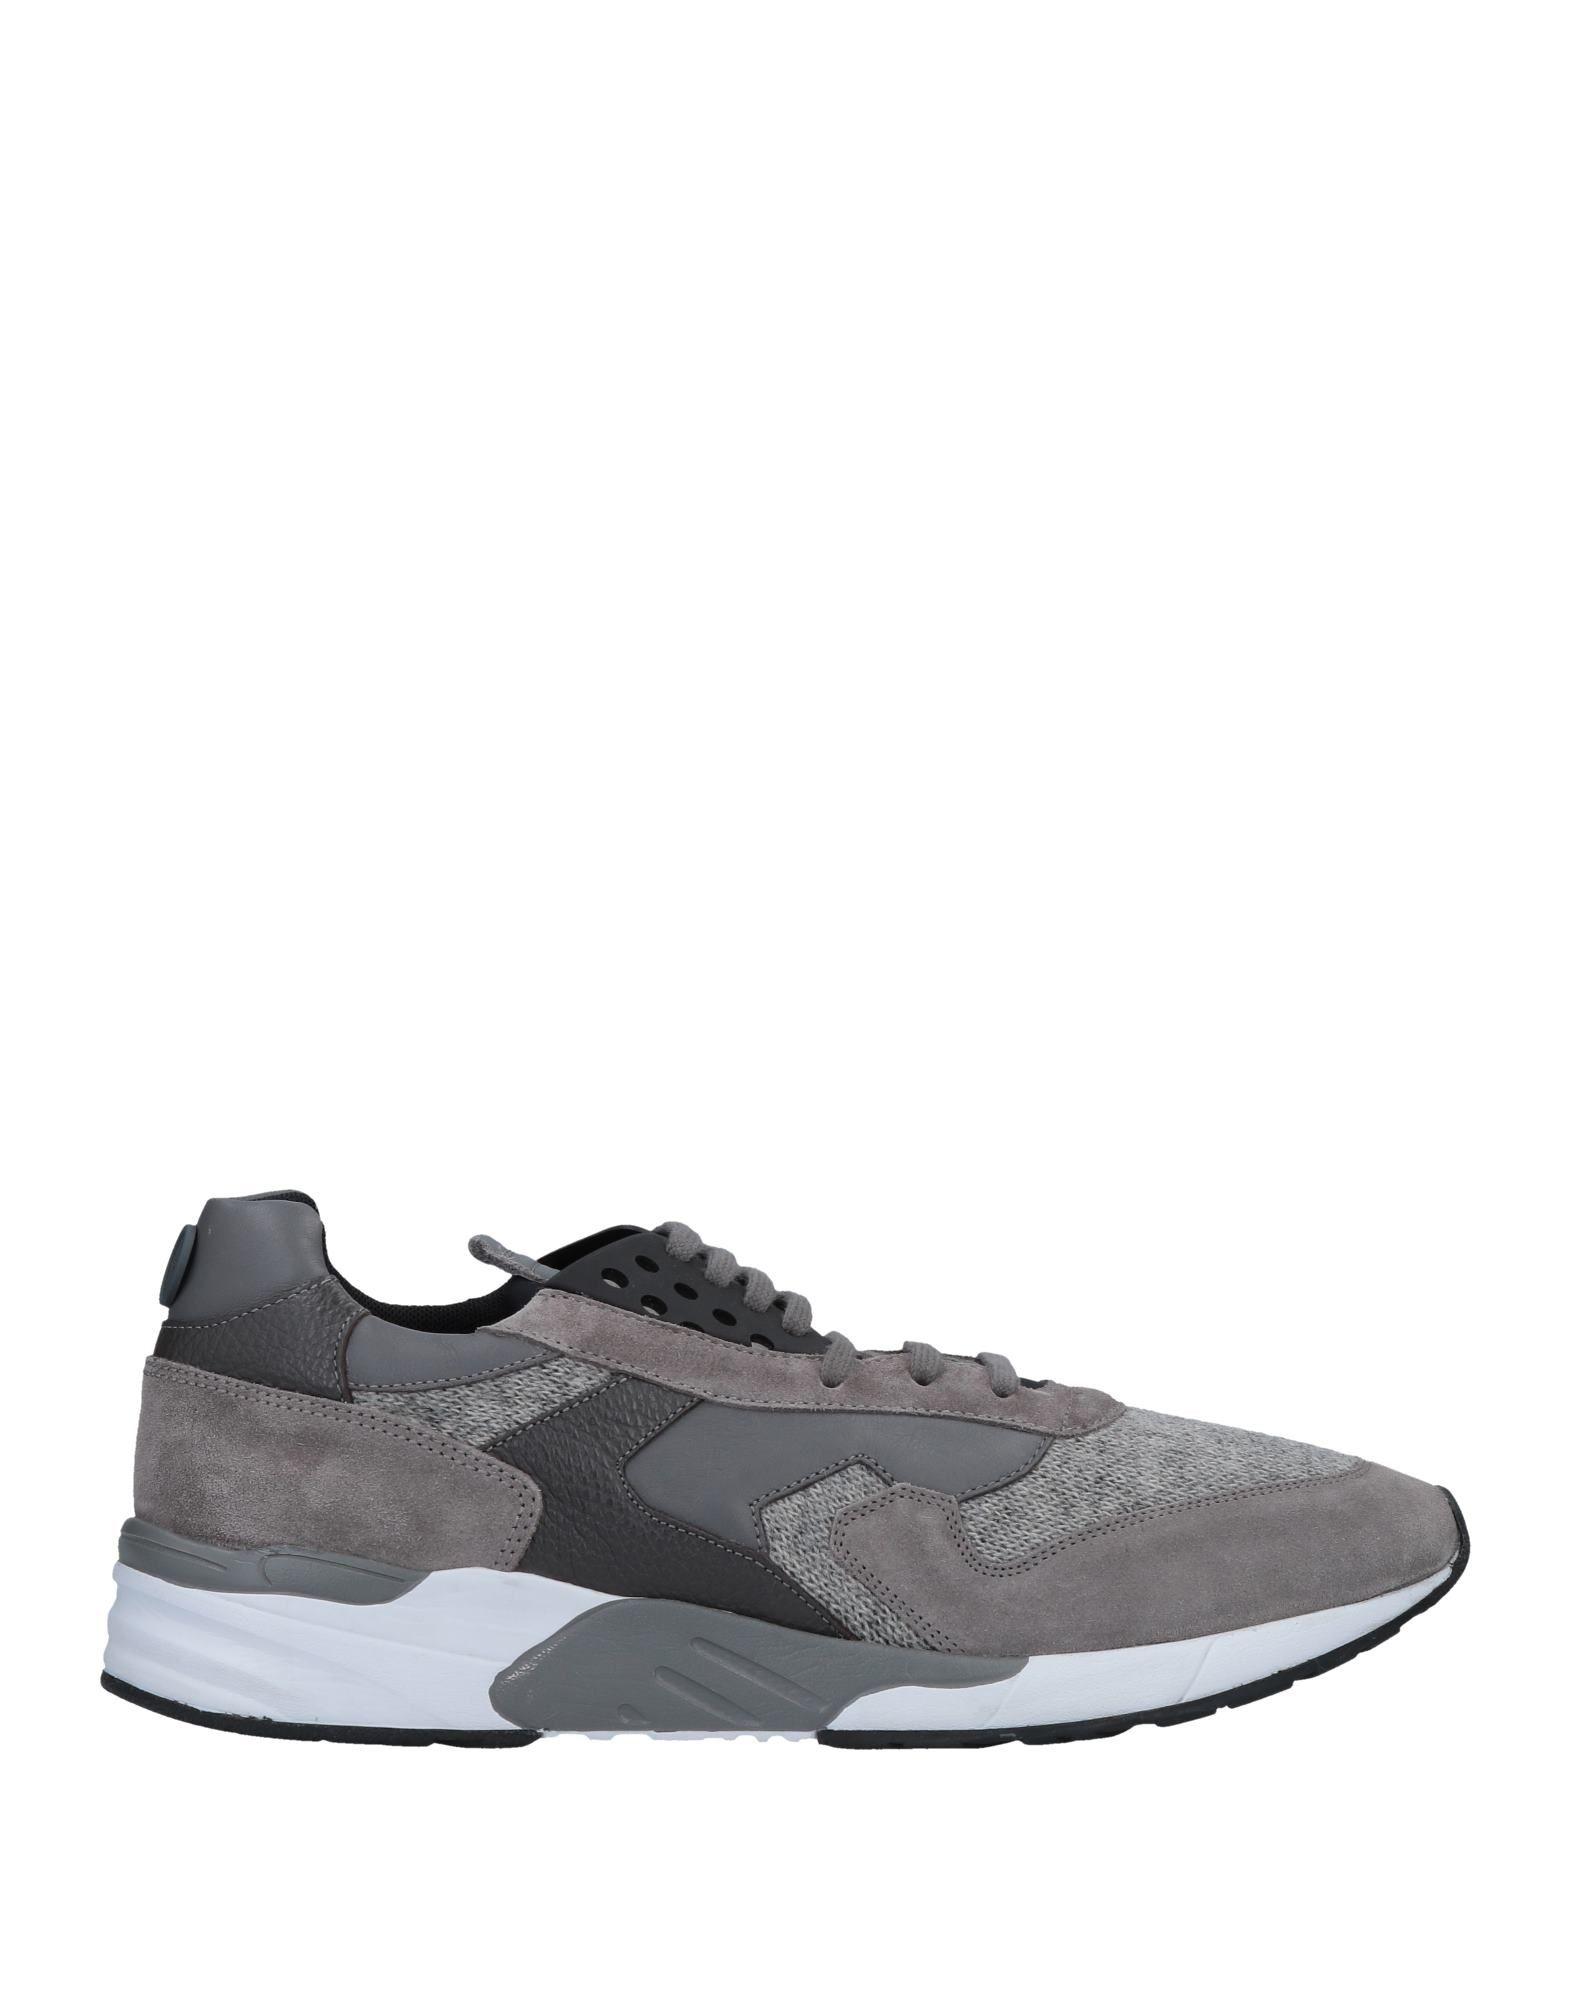 MARIANO DI VAIO Sneakers in Grey